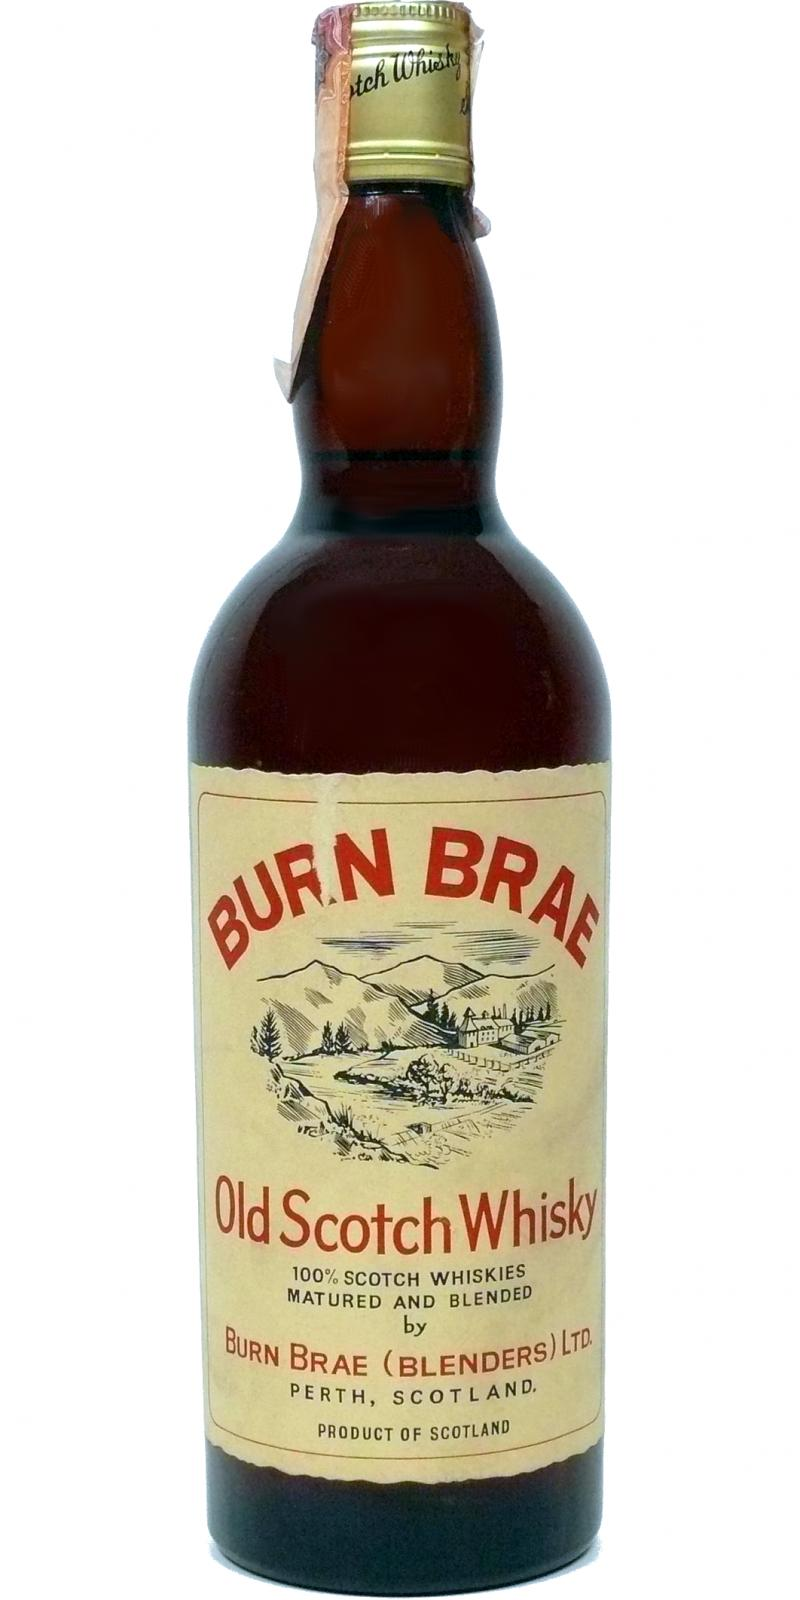 Burn Brae Old Scotch Whisky